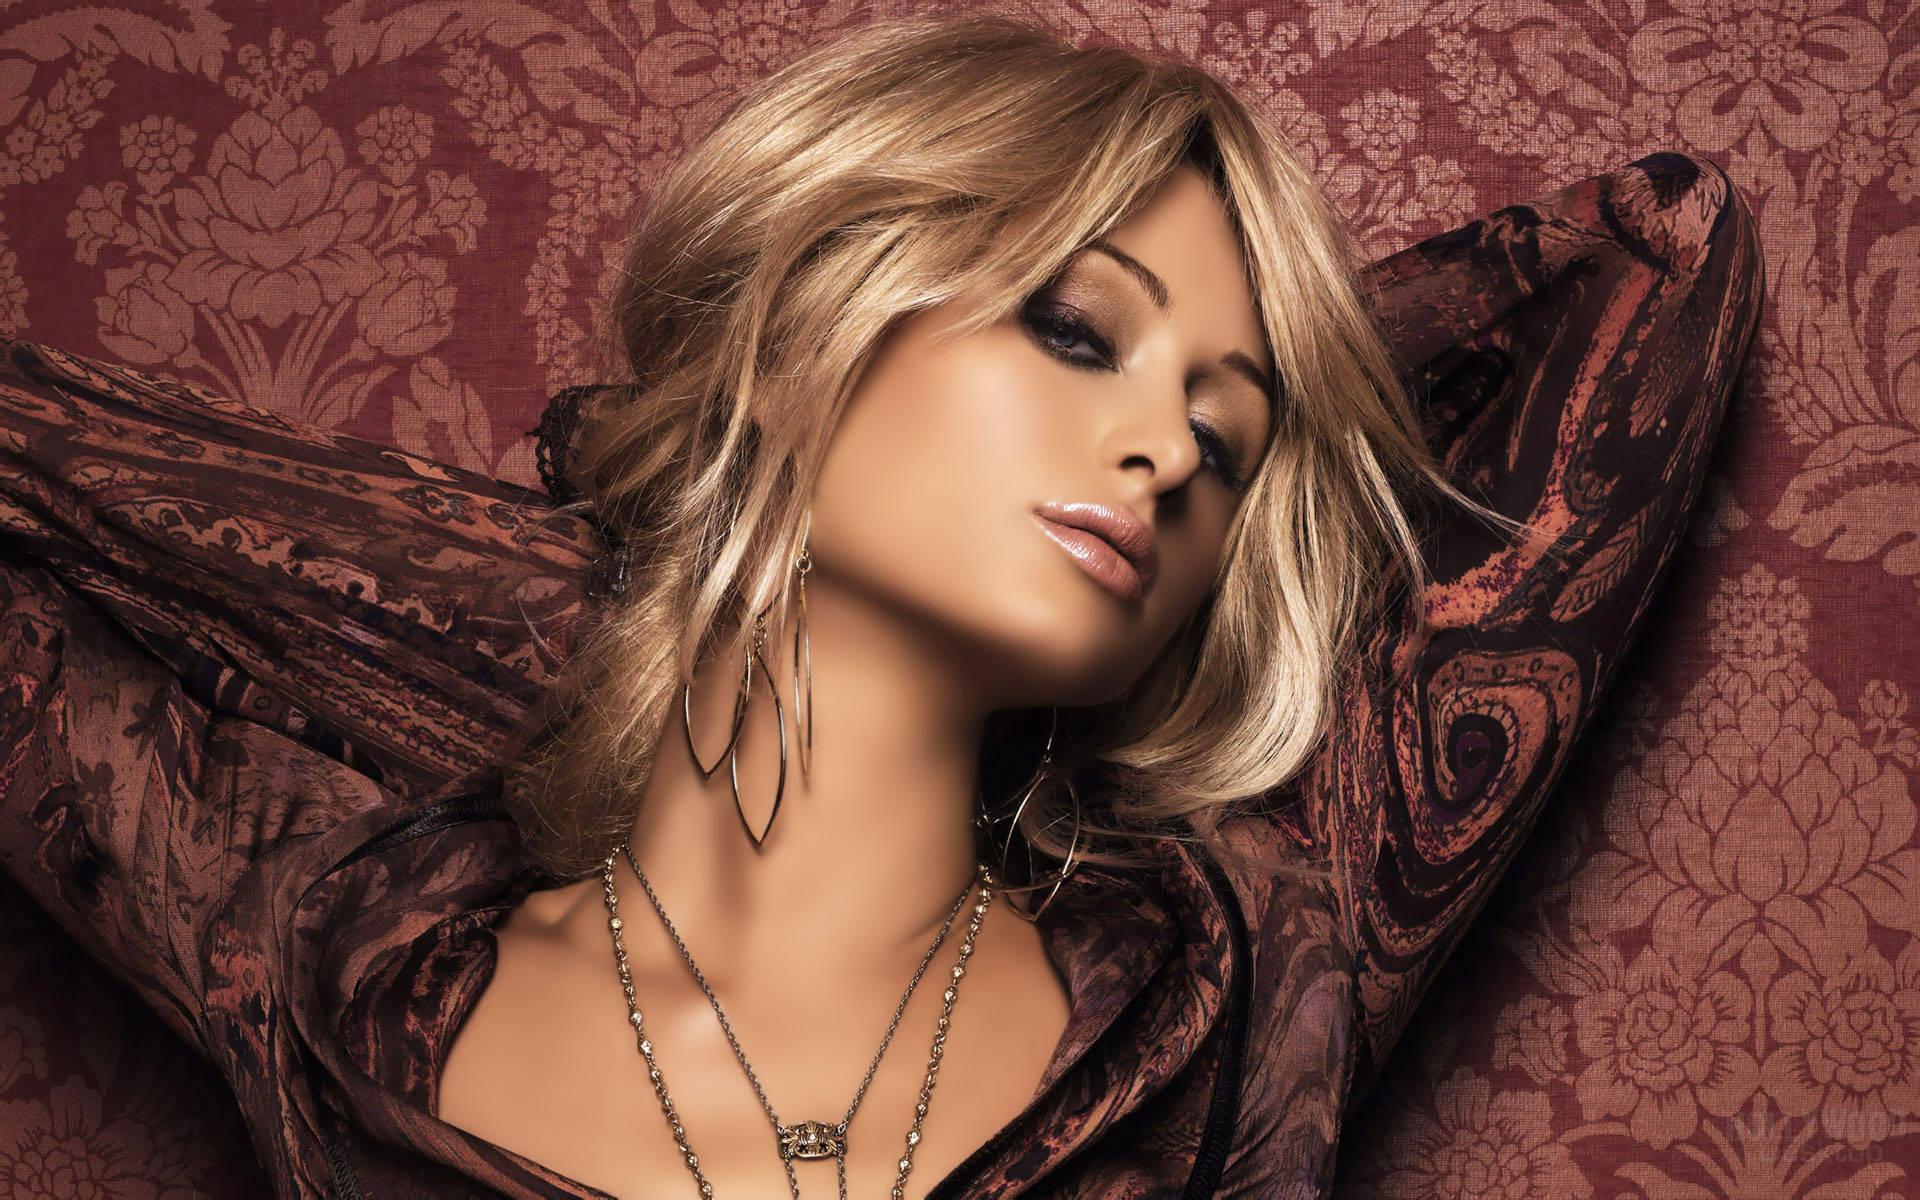 Paris Hilton Wallpaper